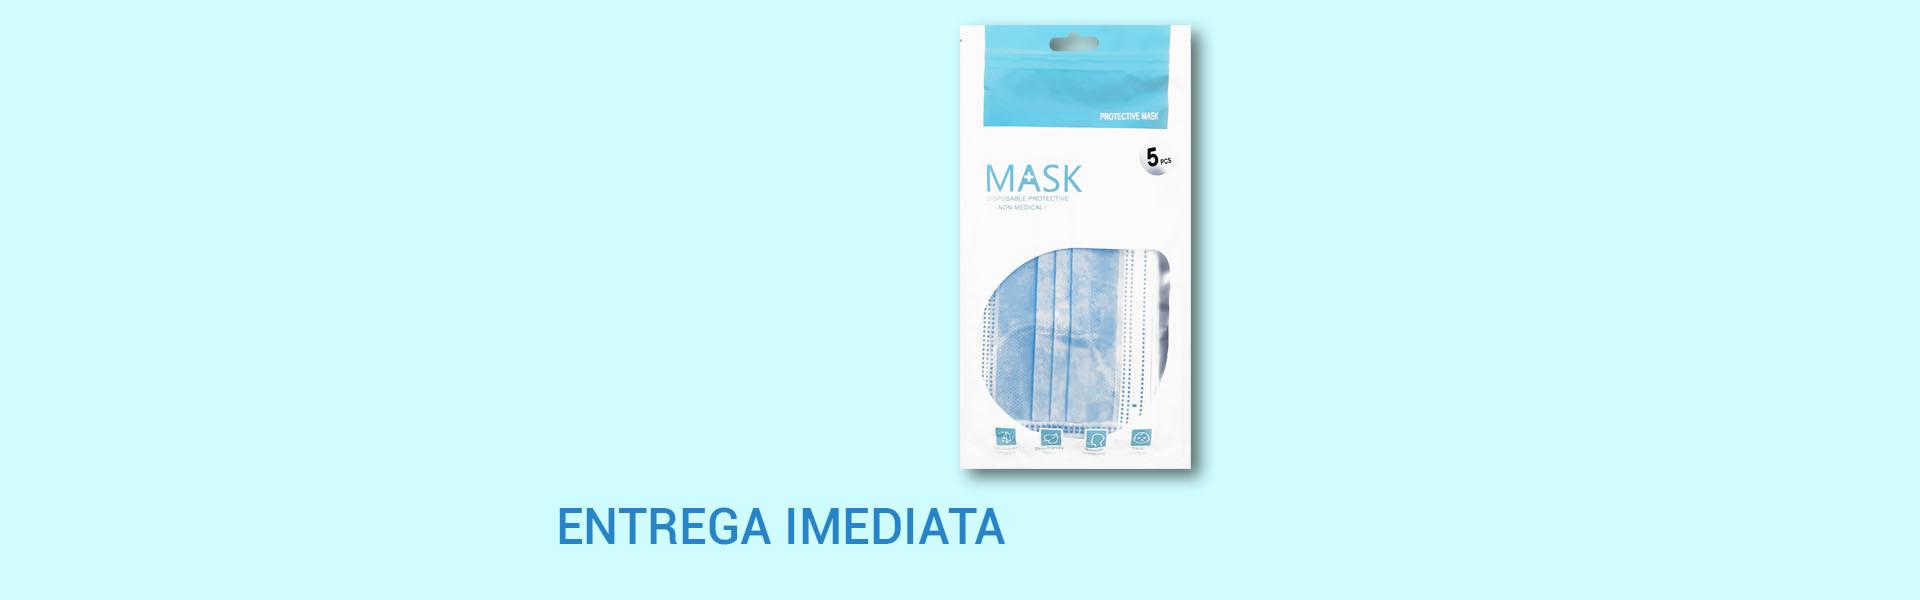 Embalagem de 5 máscaras descartáveis